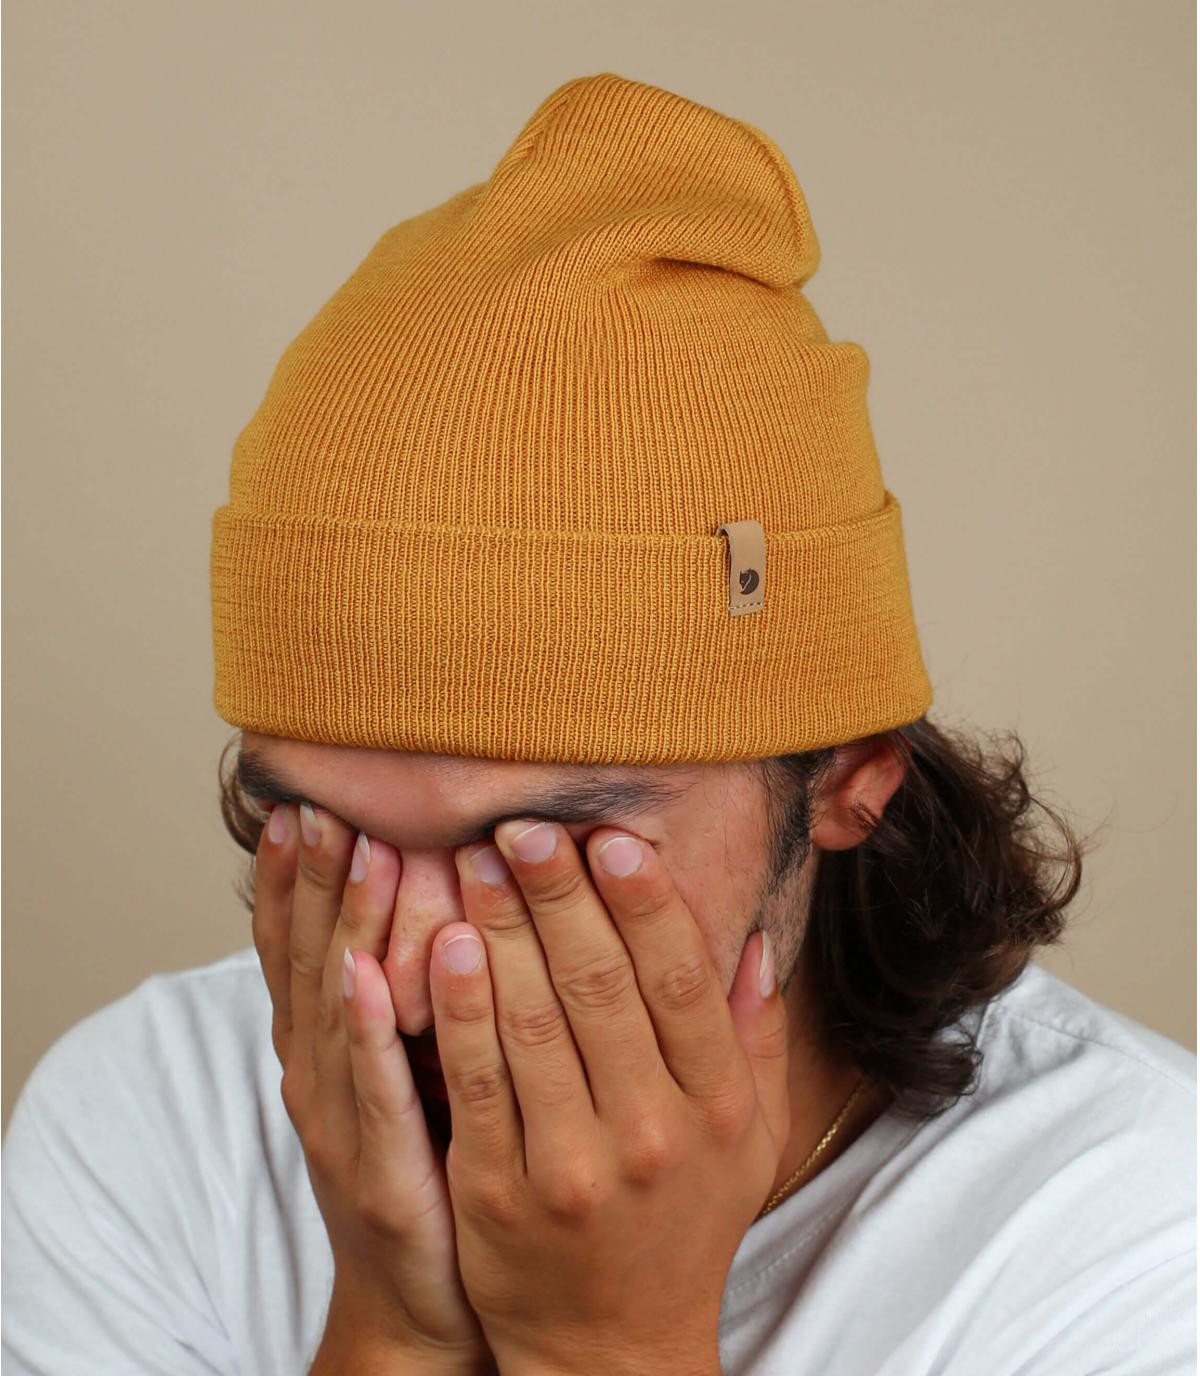 berretto di lana marrone Fjällräven